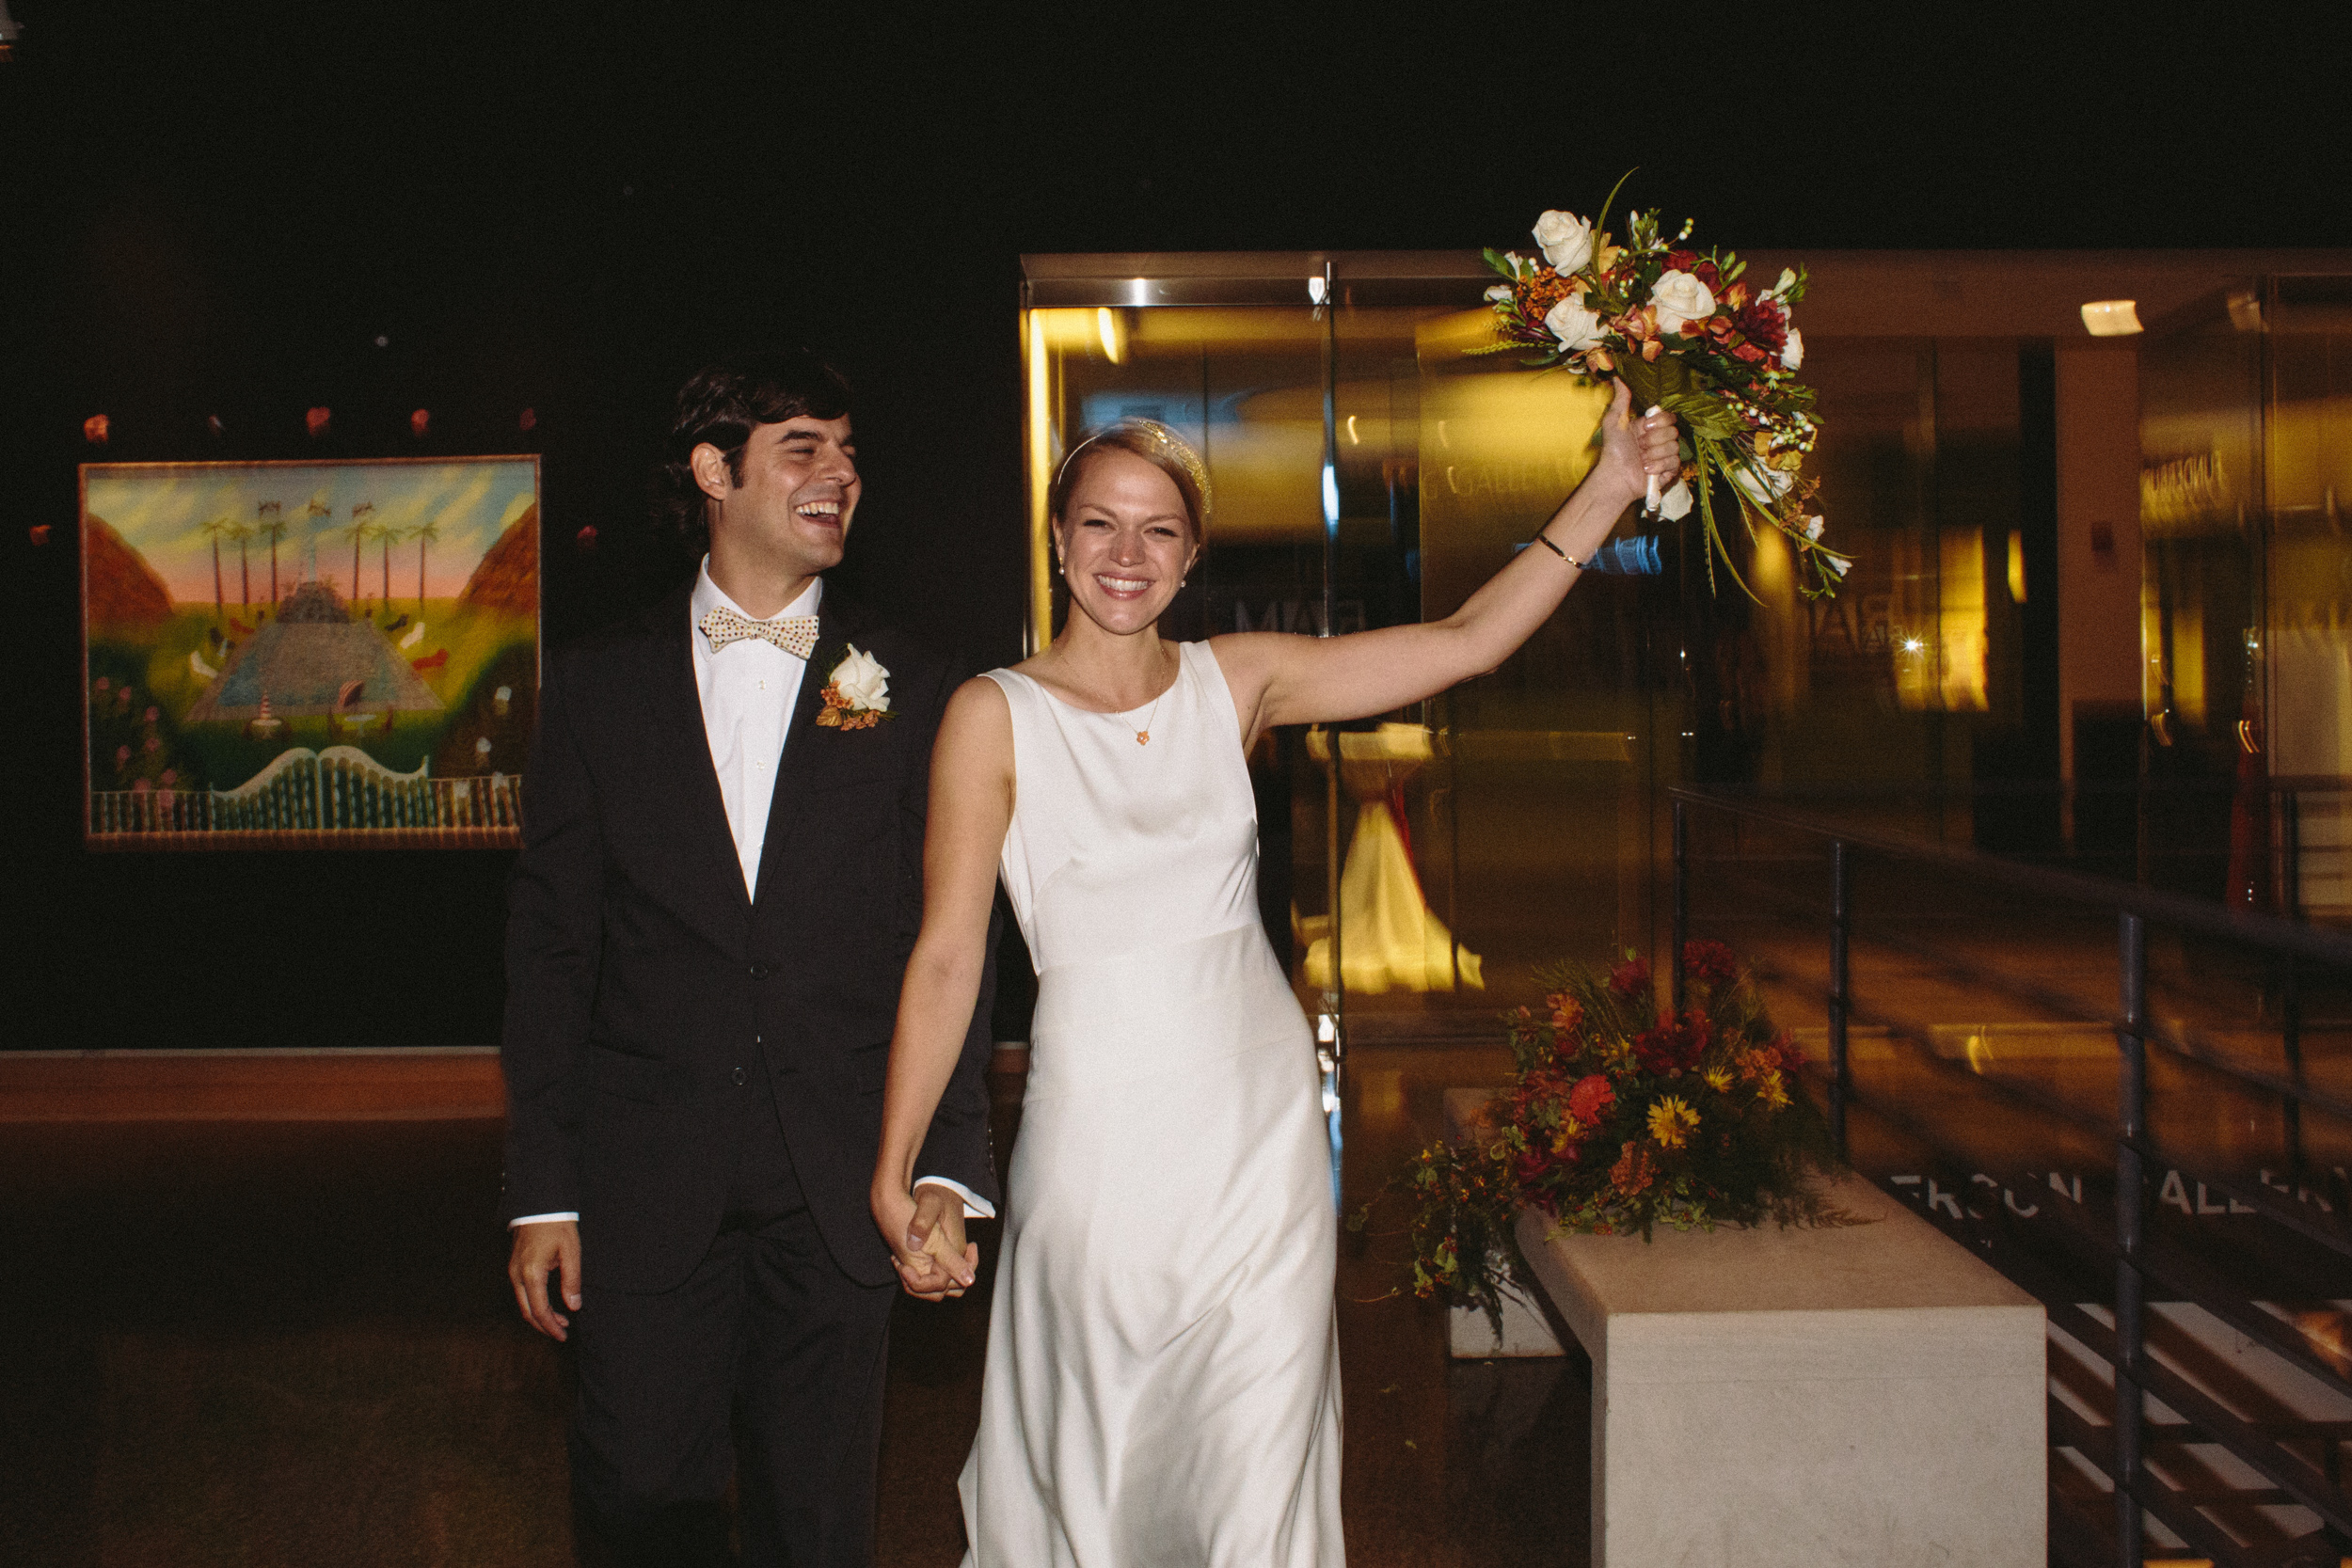 10-05-2013 maggie & adam wedding photography by brian milo-154.jpg